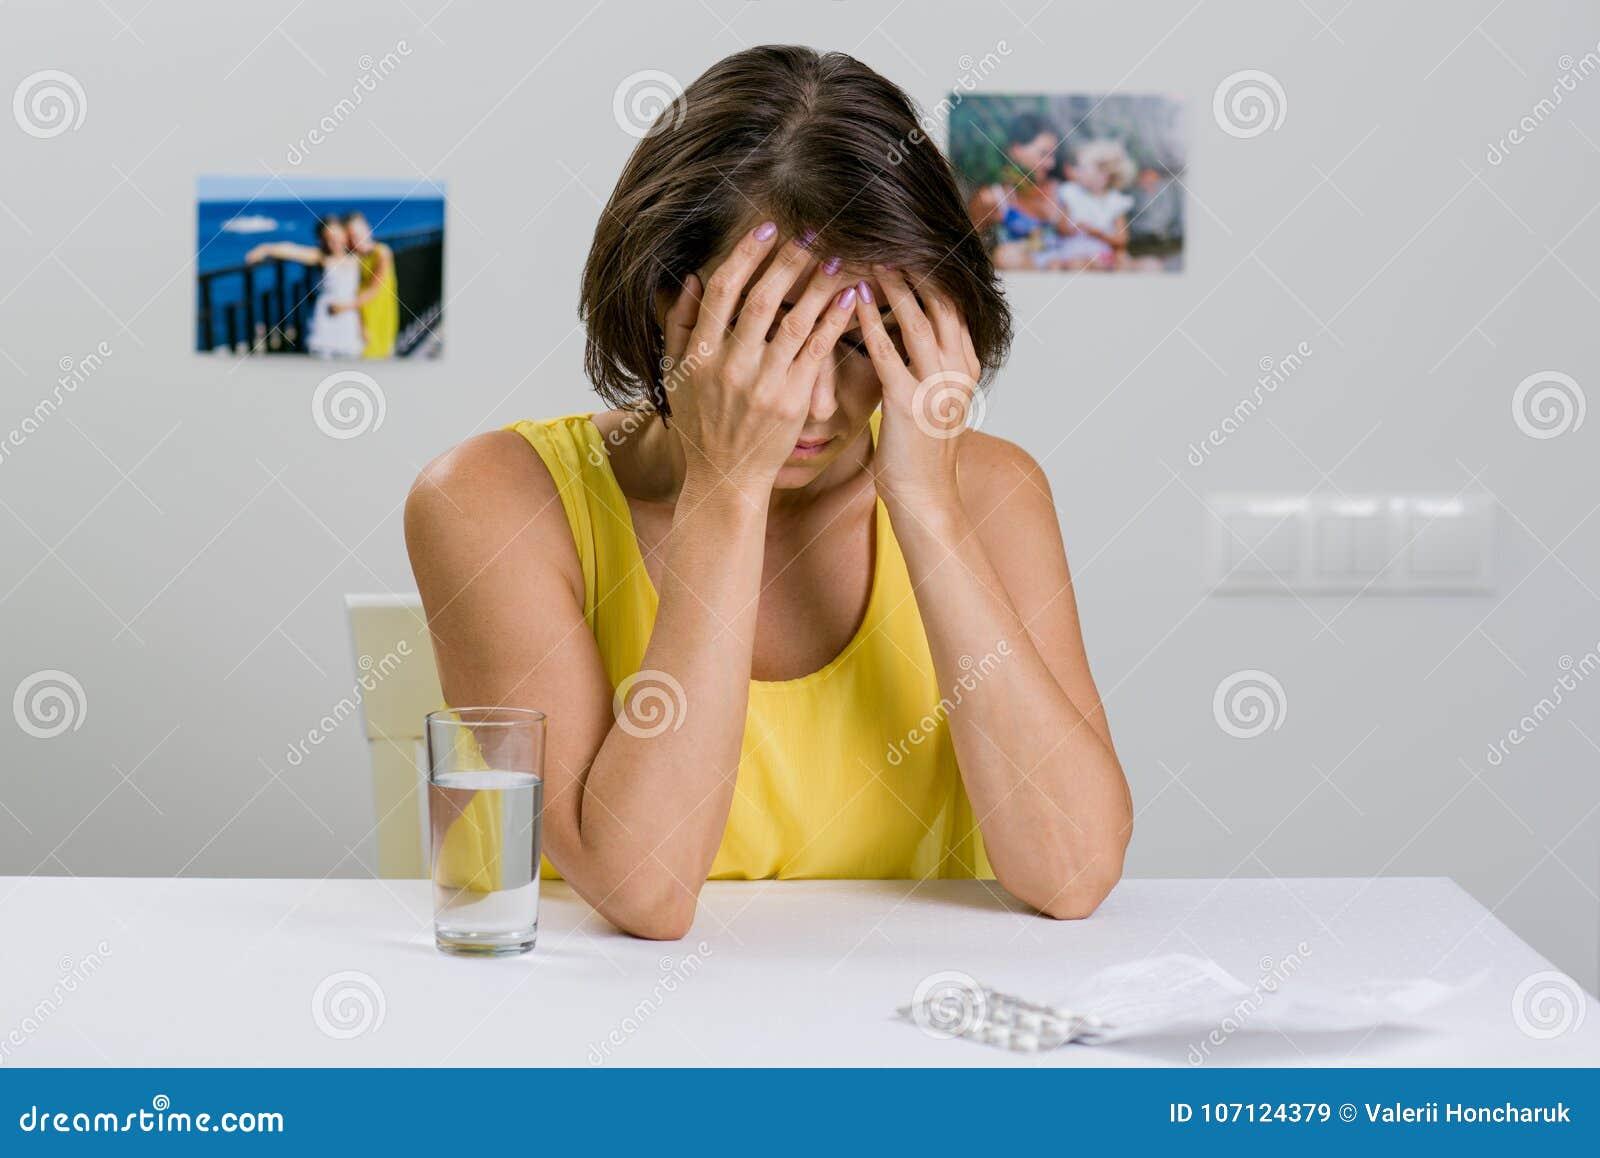 Una hembra adulta sufre de un dolor de cabeza severo